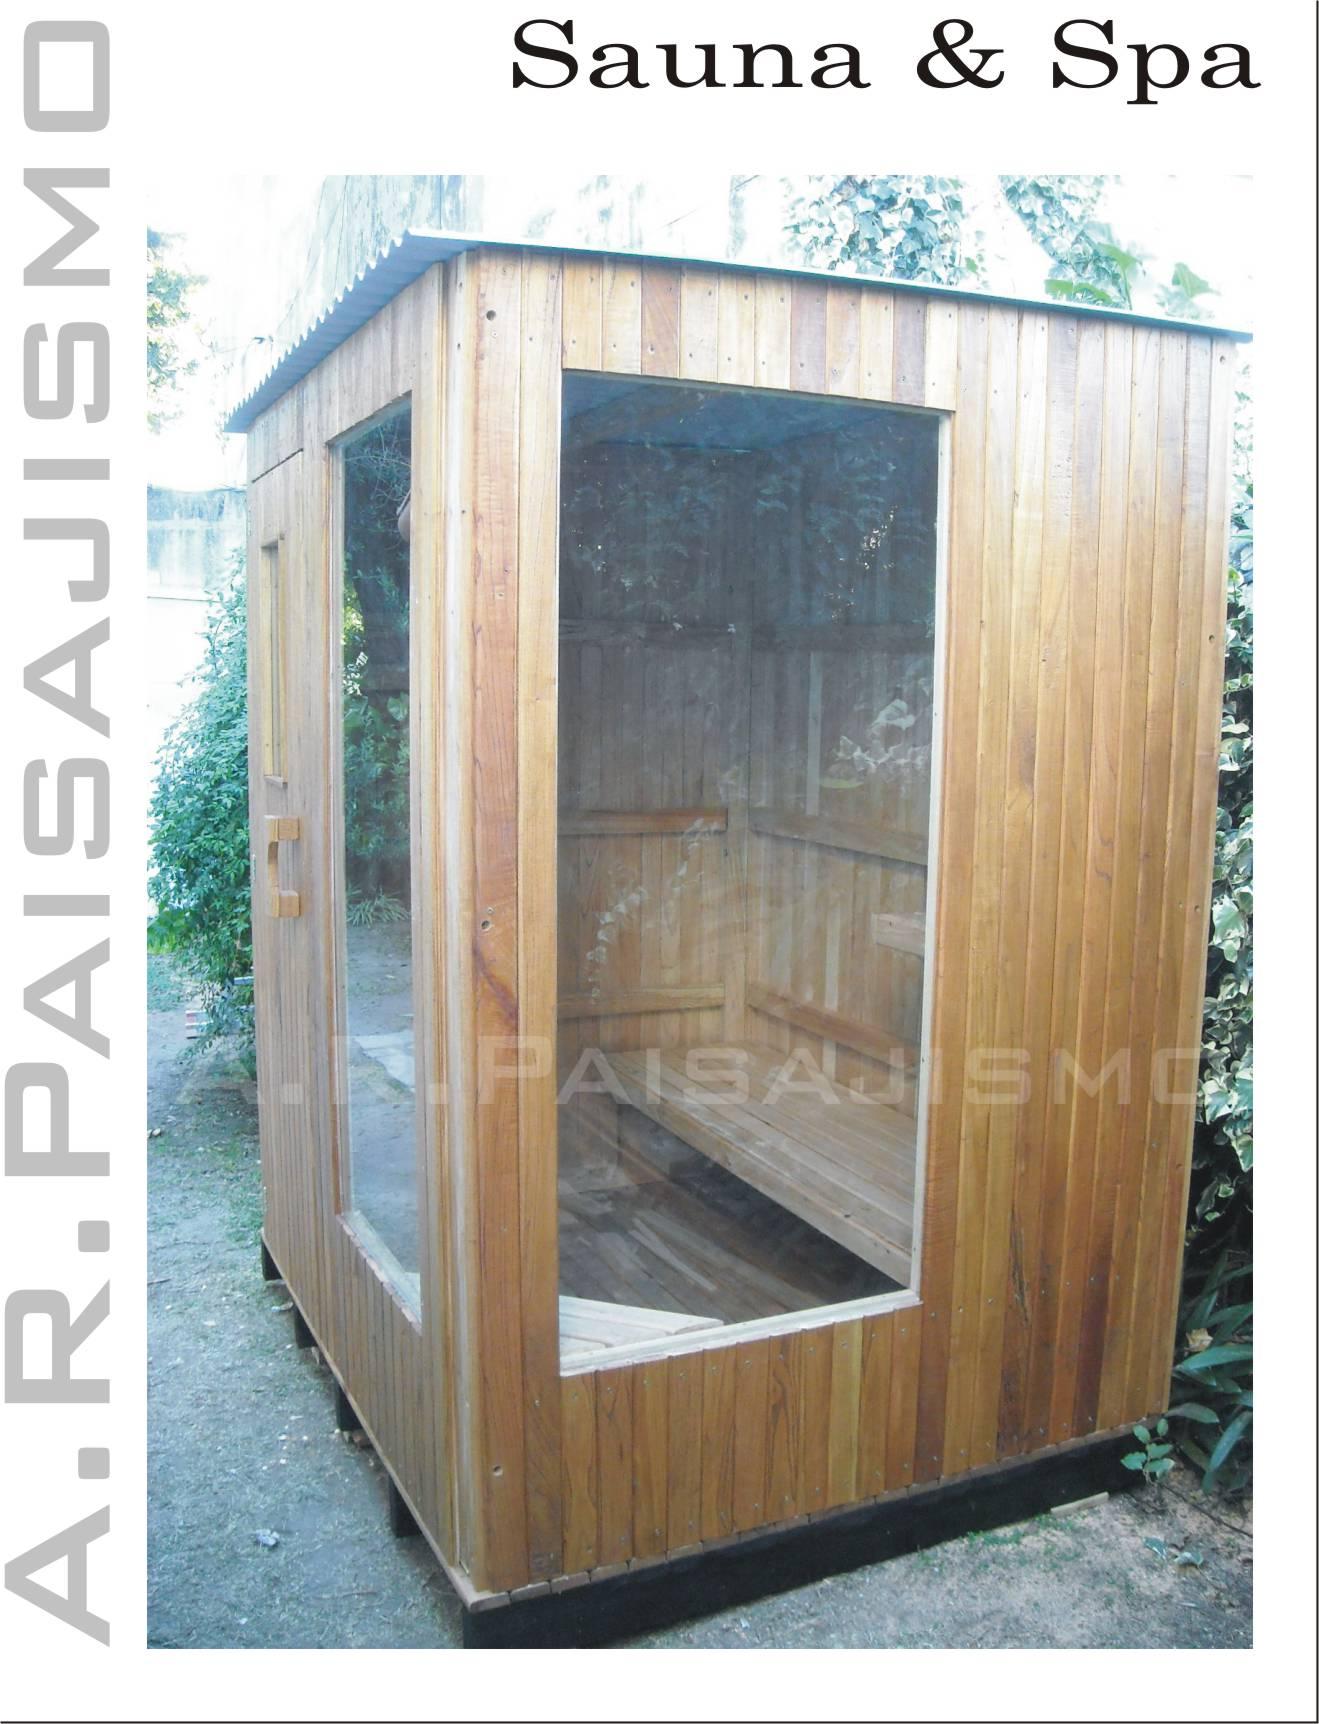 Bano Sauna Madera Completo Intemperie Con Calefactor 4kw - Sauna-madera